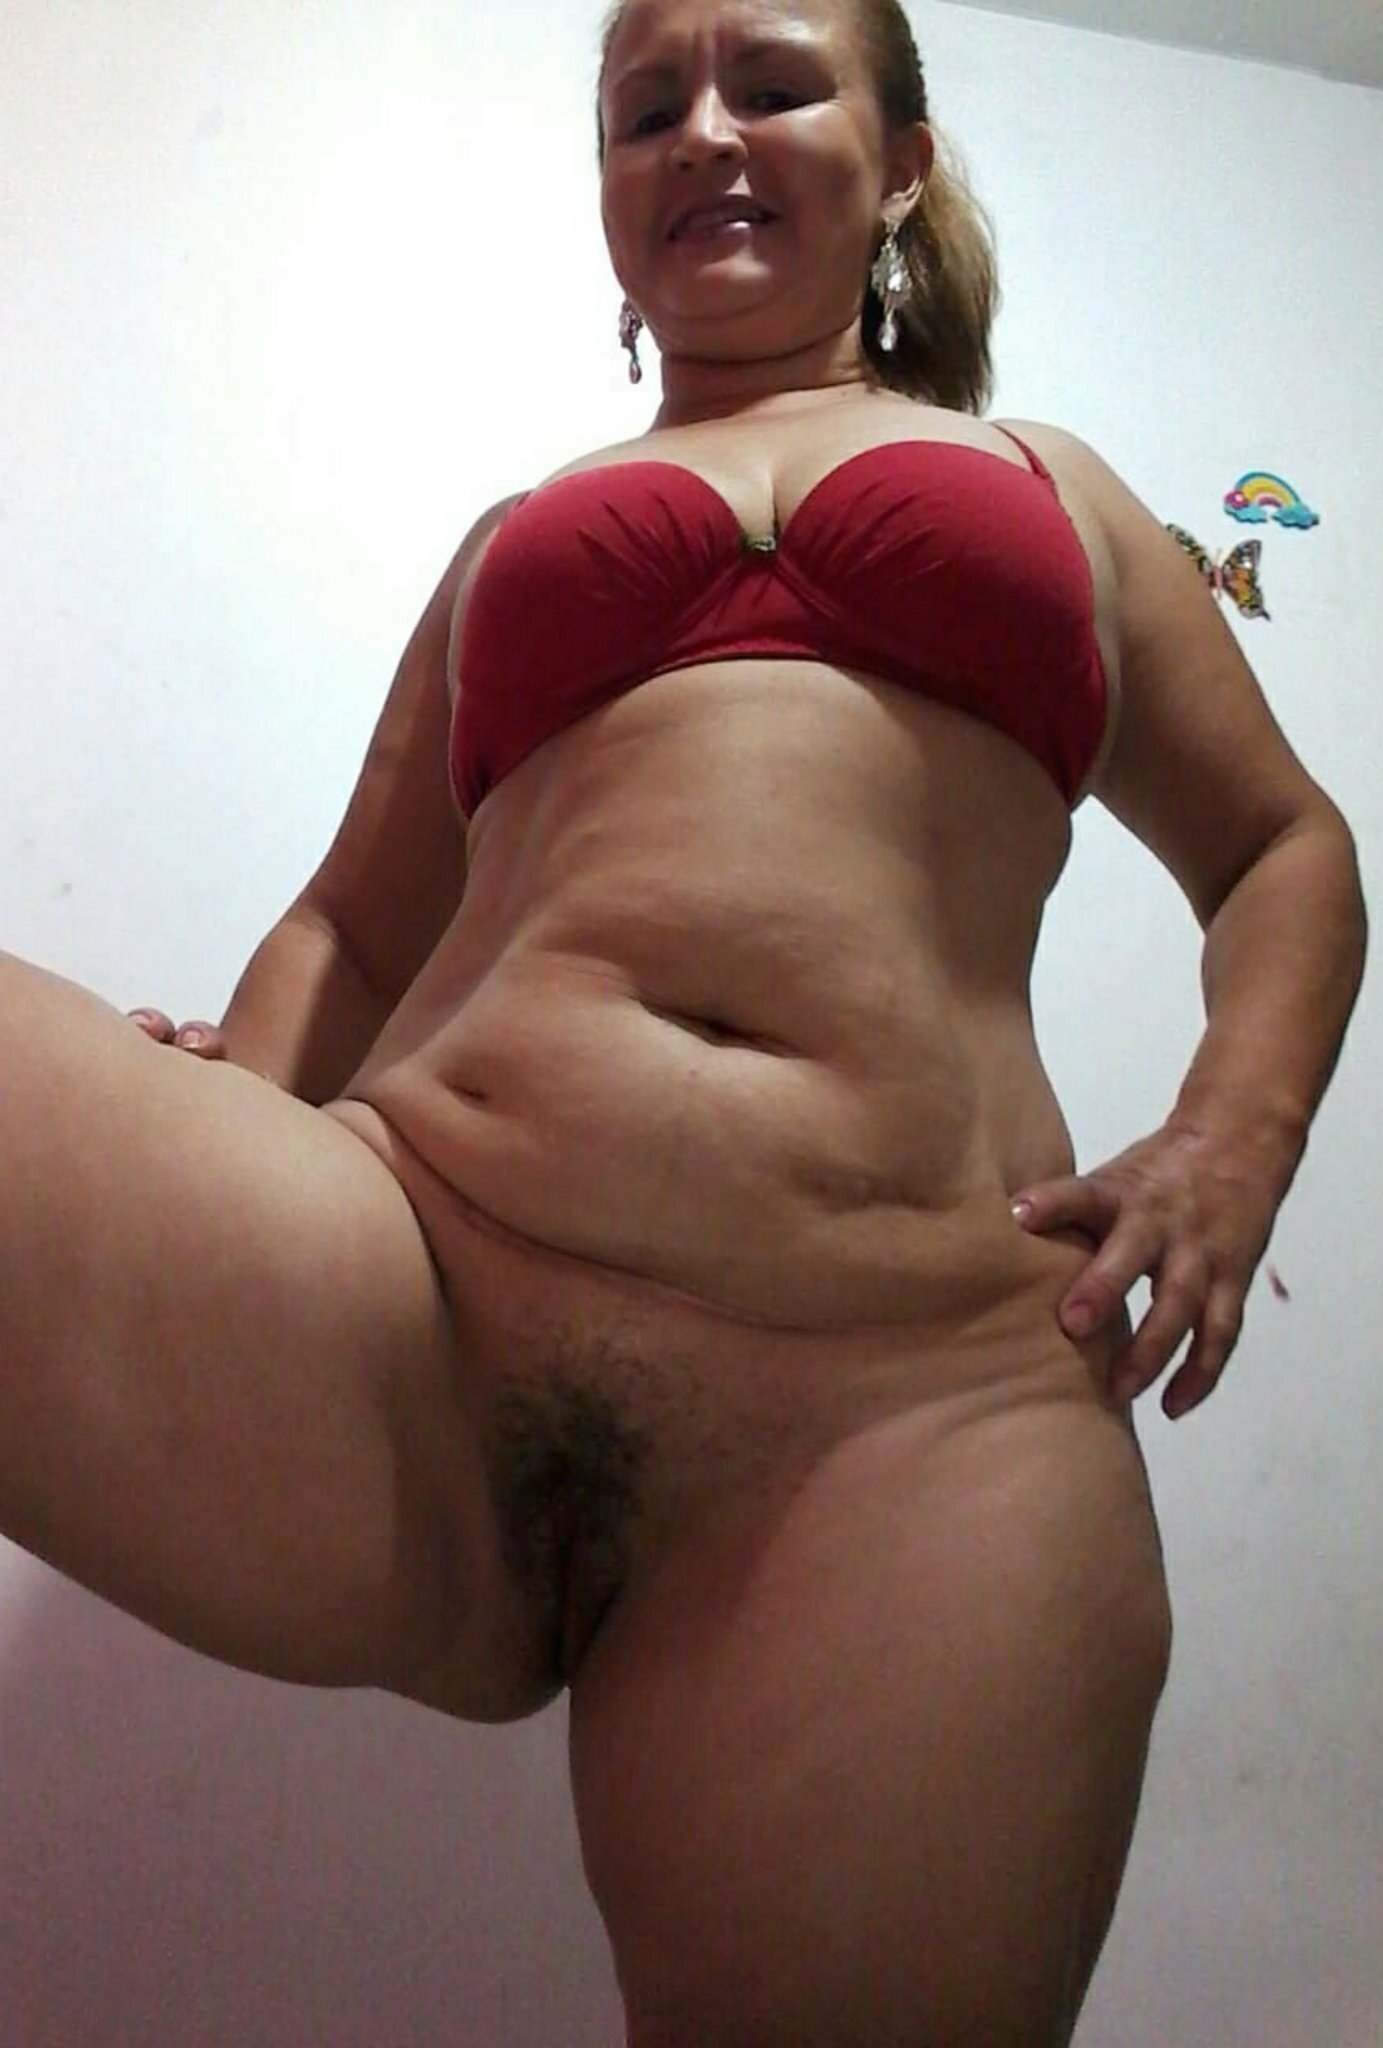 Fotos Maduras viejas para follar, imagenes porno sexo mujeres viejas 13